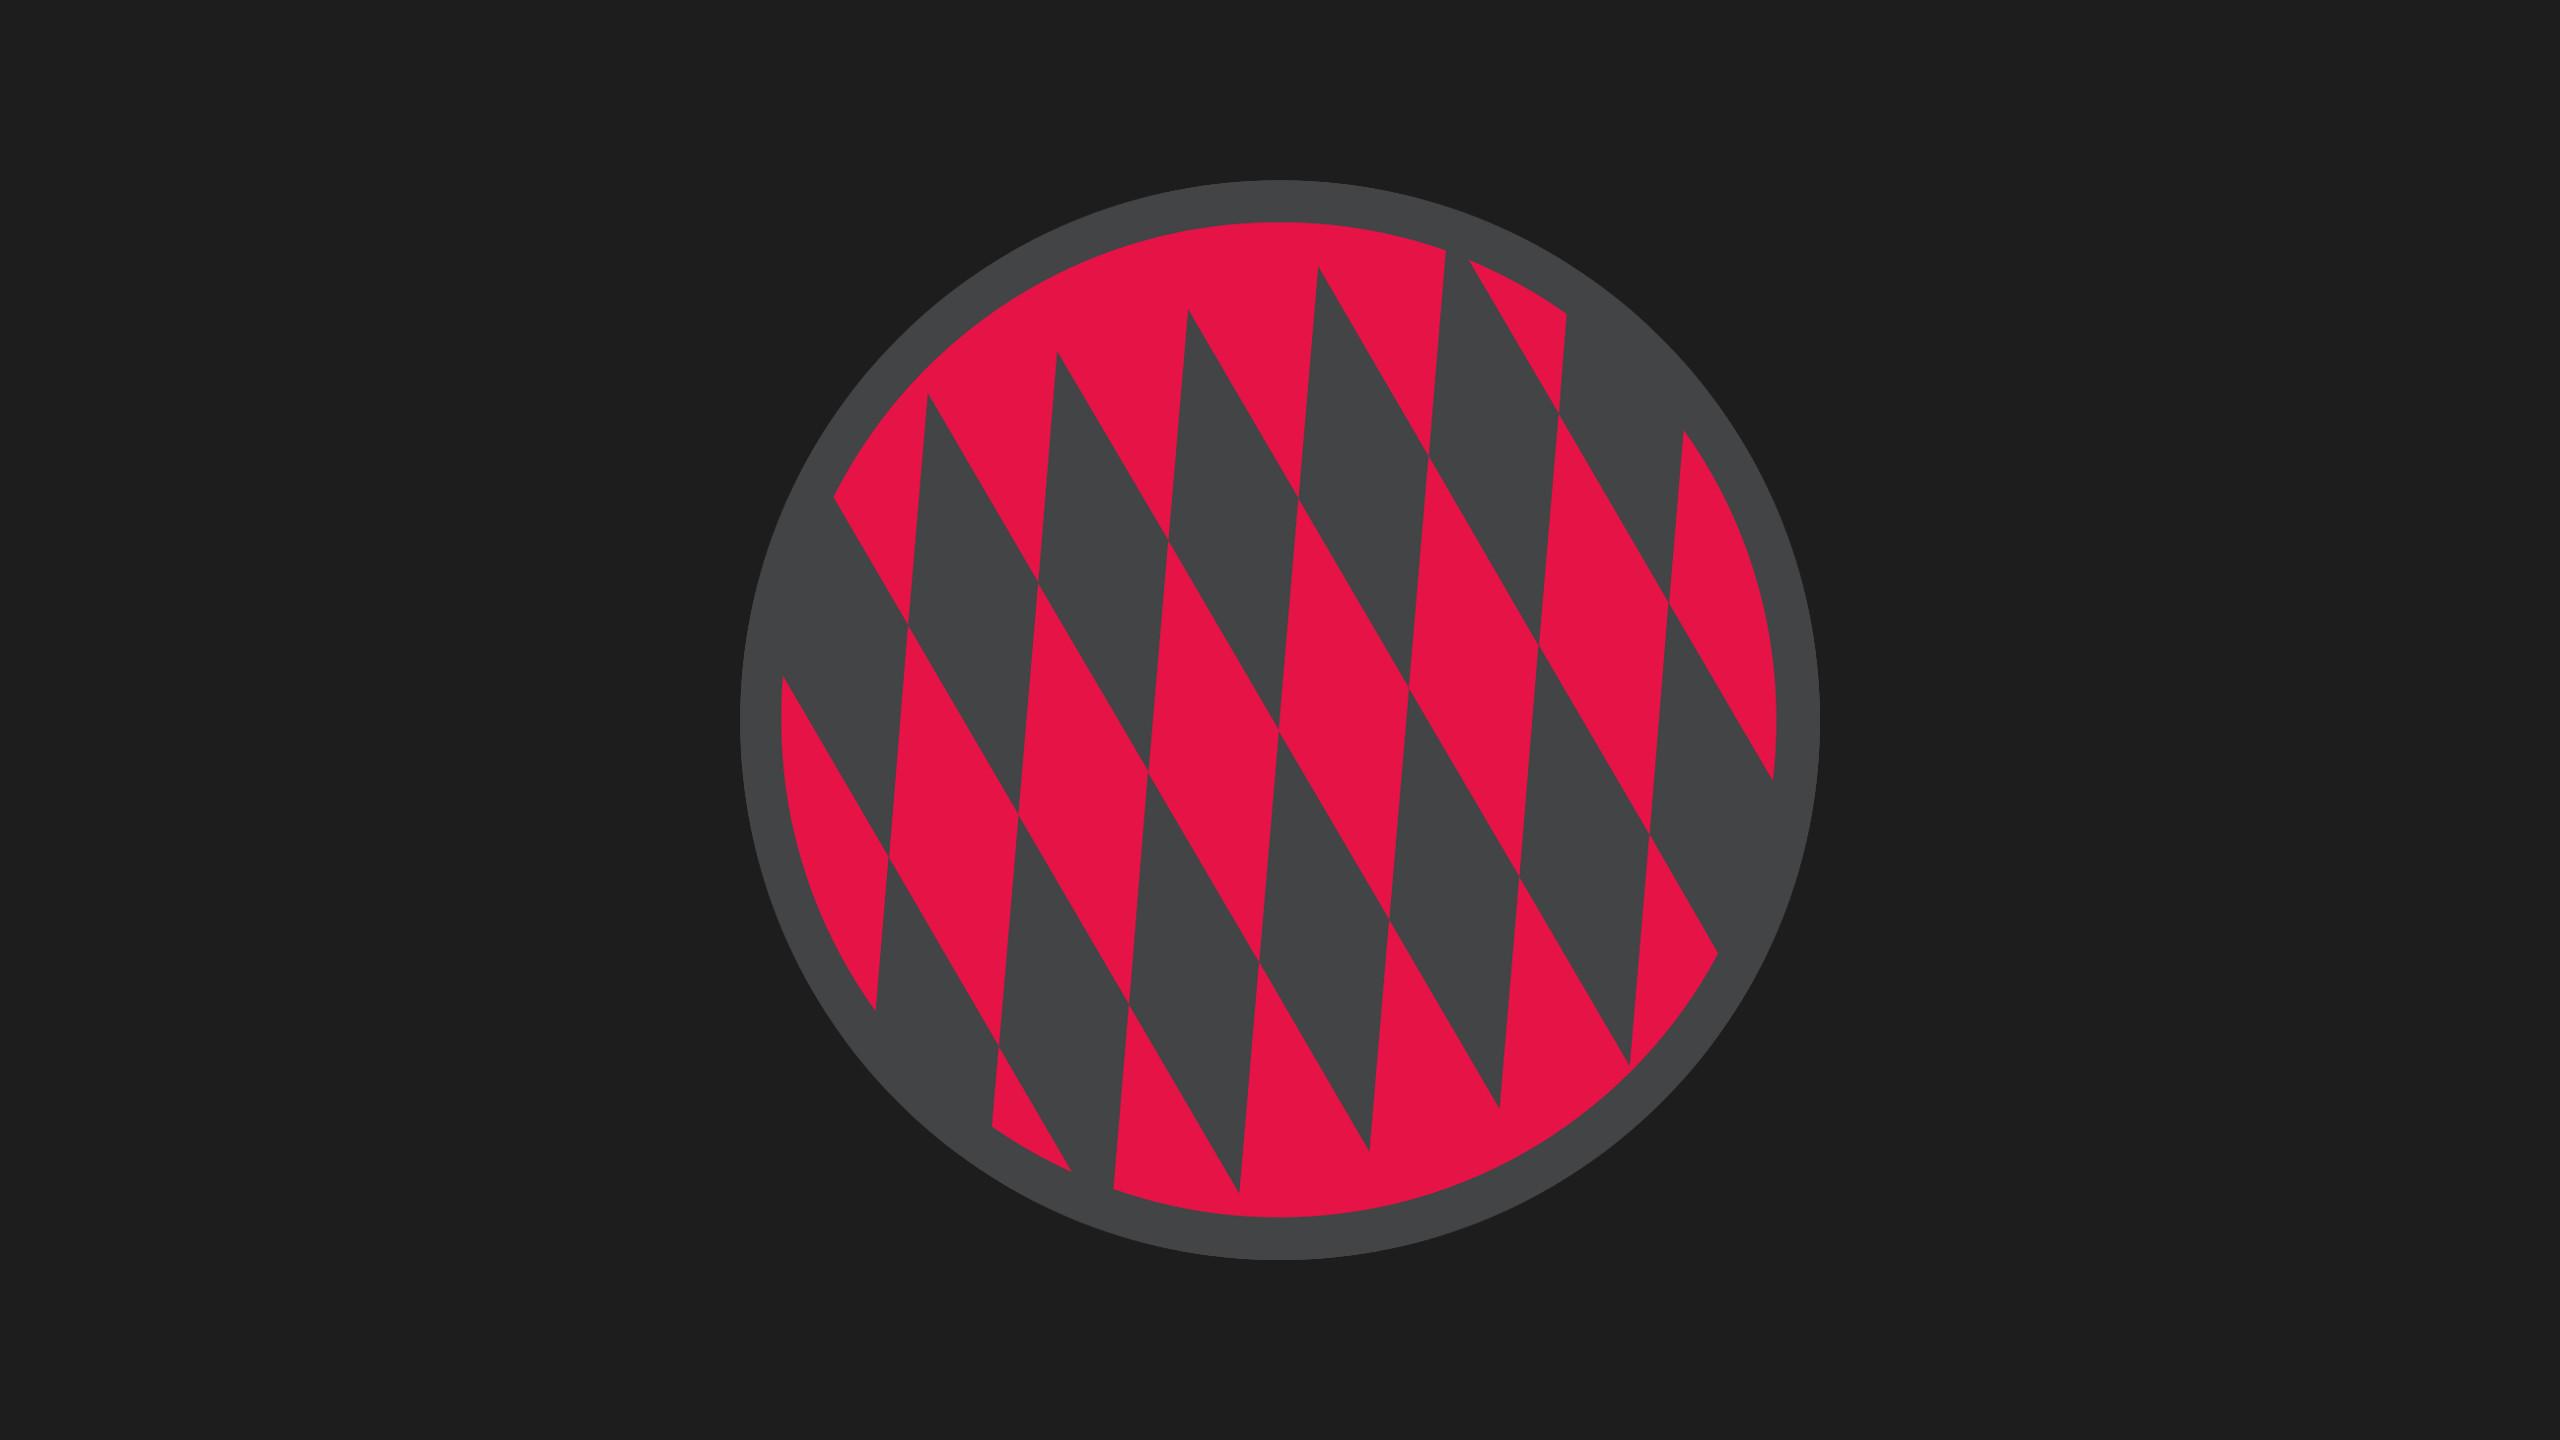 Bayern Munich Wallpapers – wallpaper hd